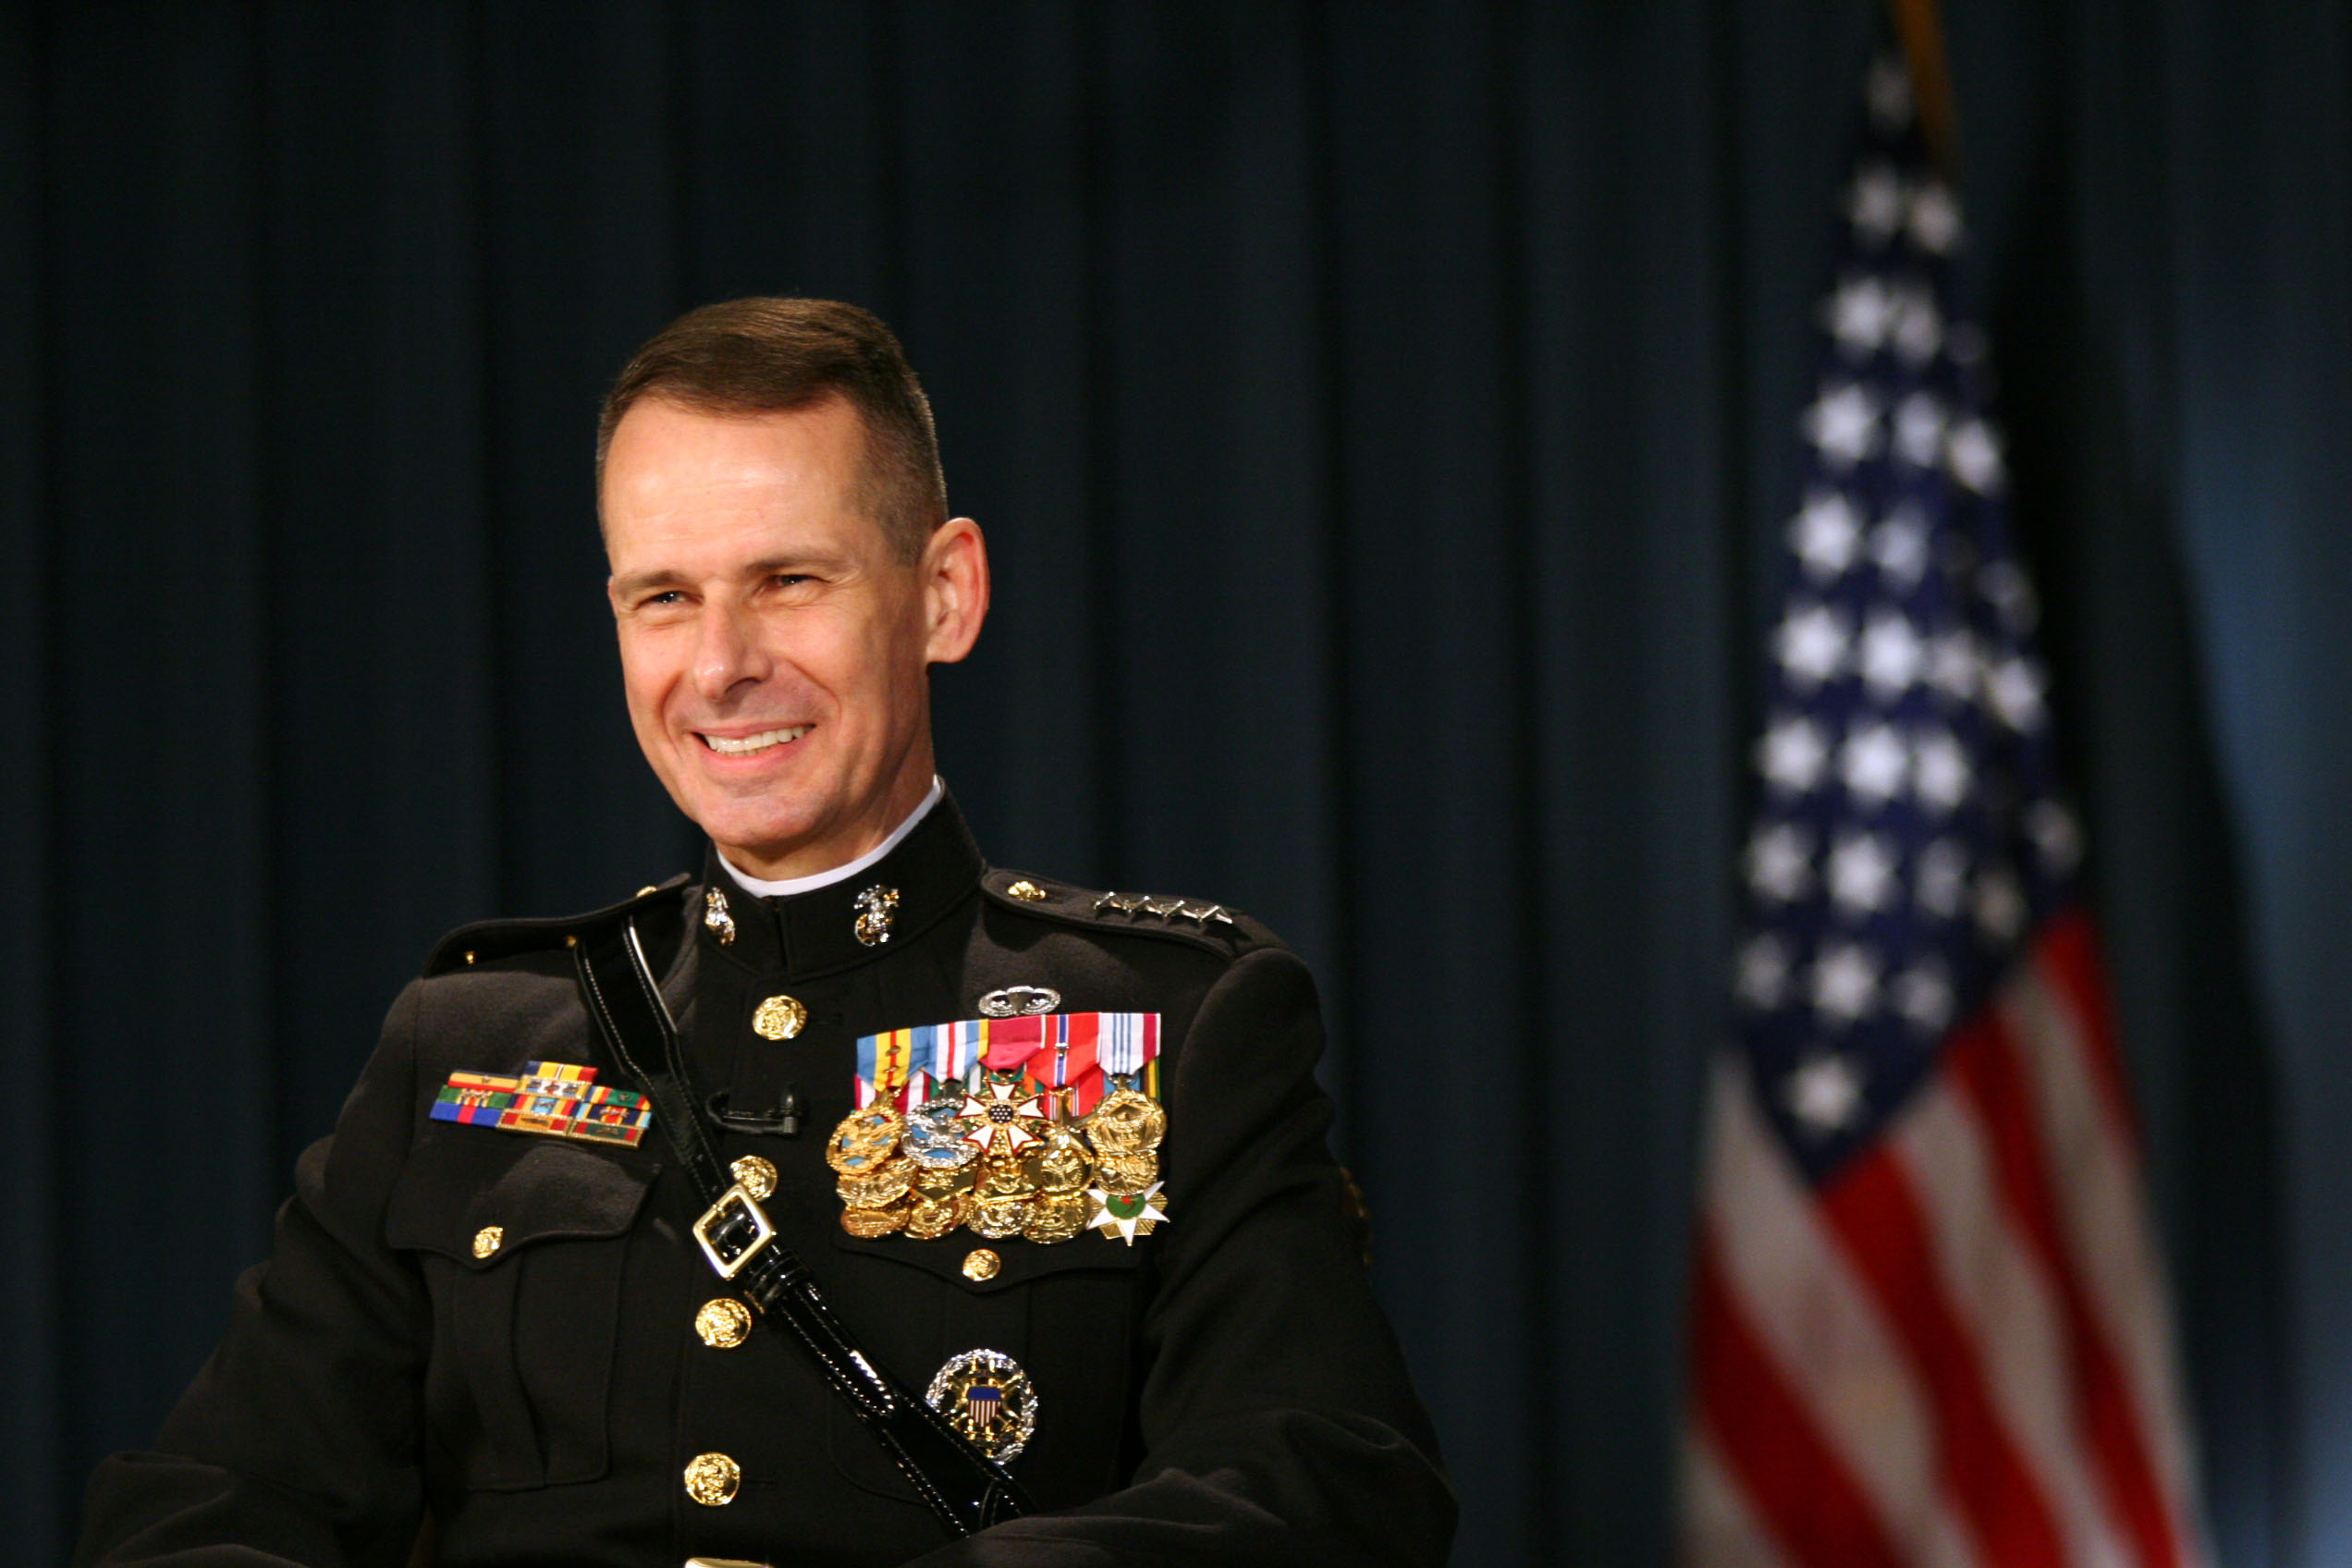 Gen. Peter Pace-5